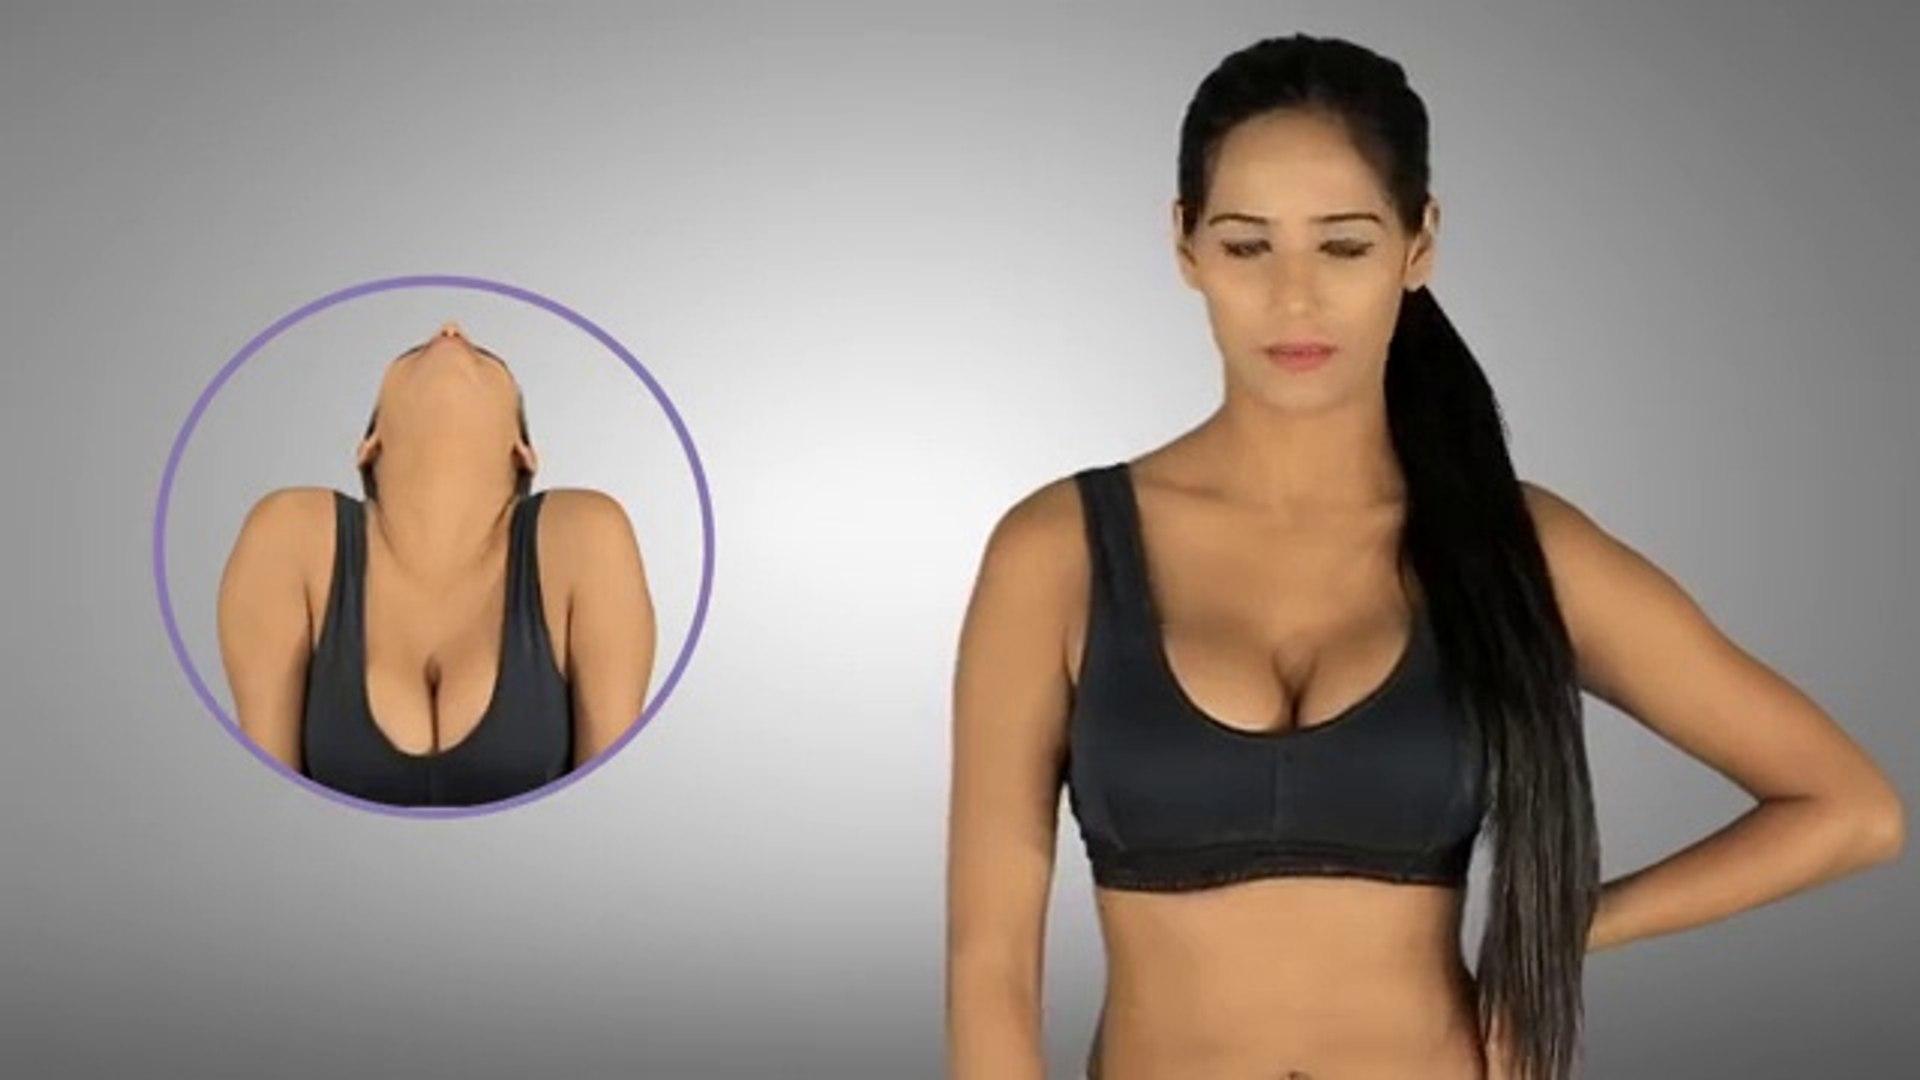 HOTTT !!! Poonam Pandey Style Yoga - Be Hot & Fit Like Me